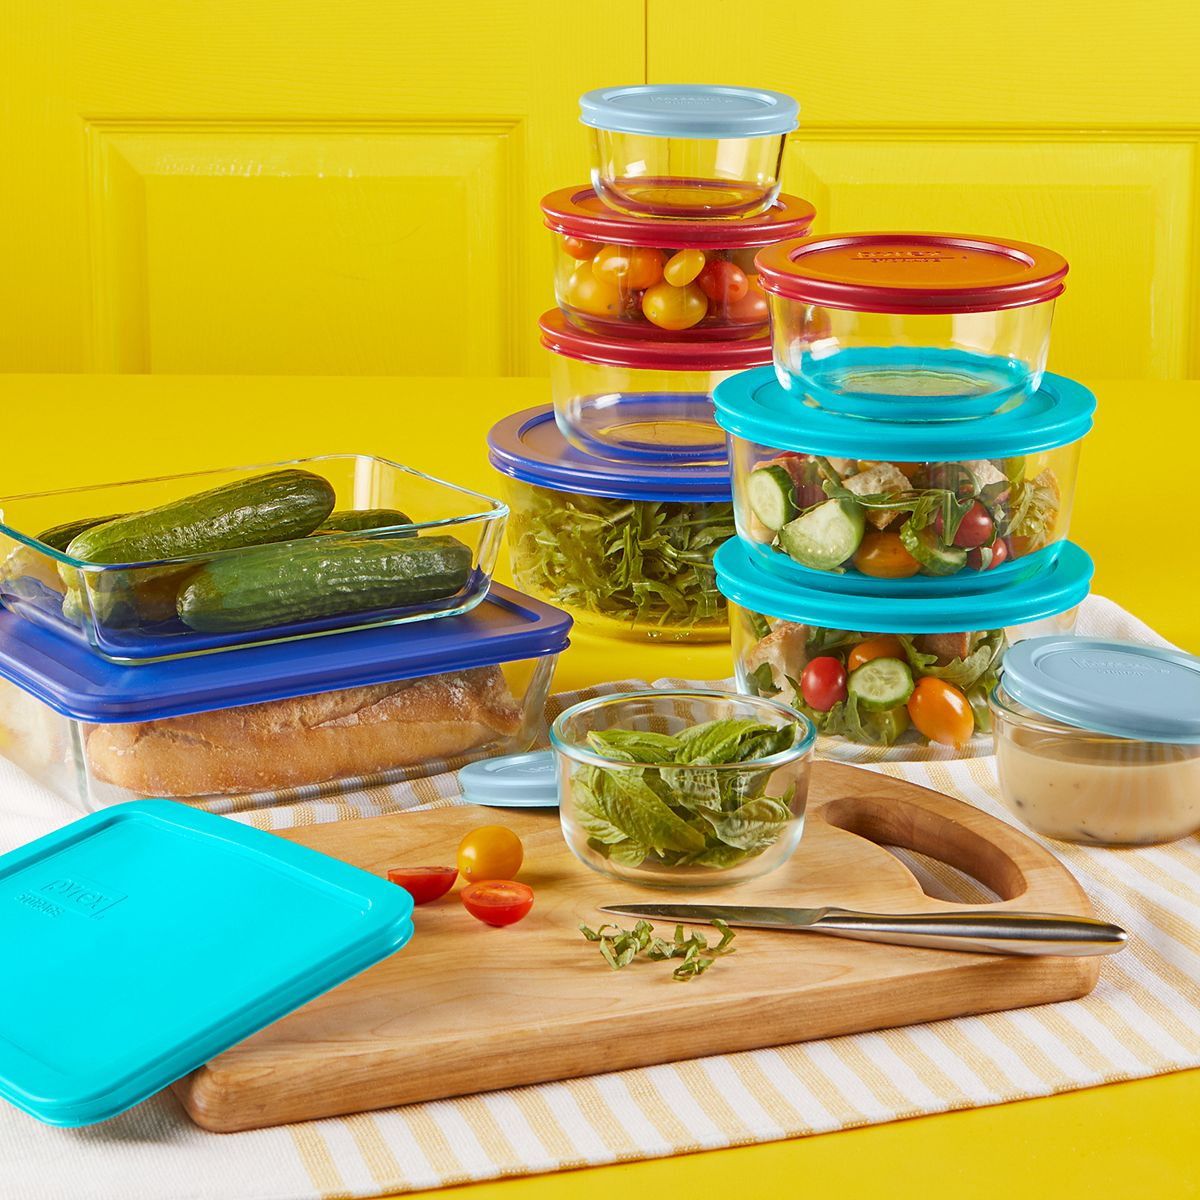 Pyrex 22-pc. Glass Food Storage Set $29.99